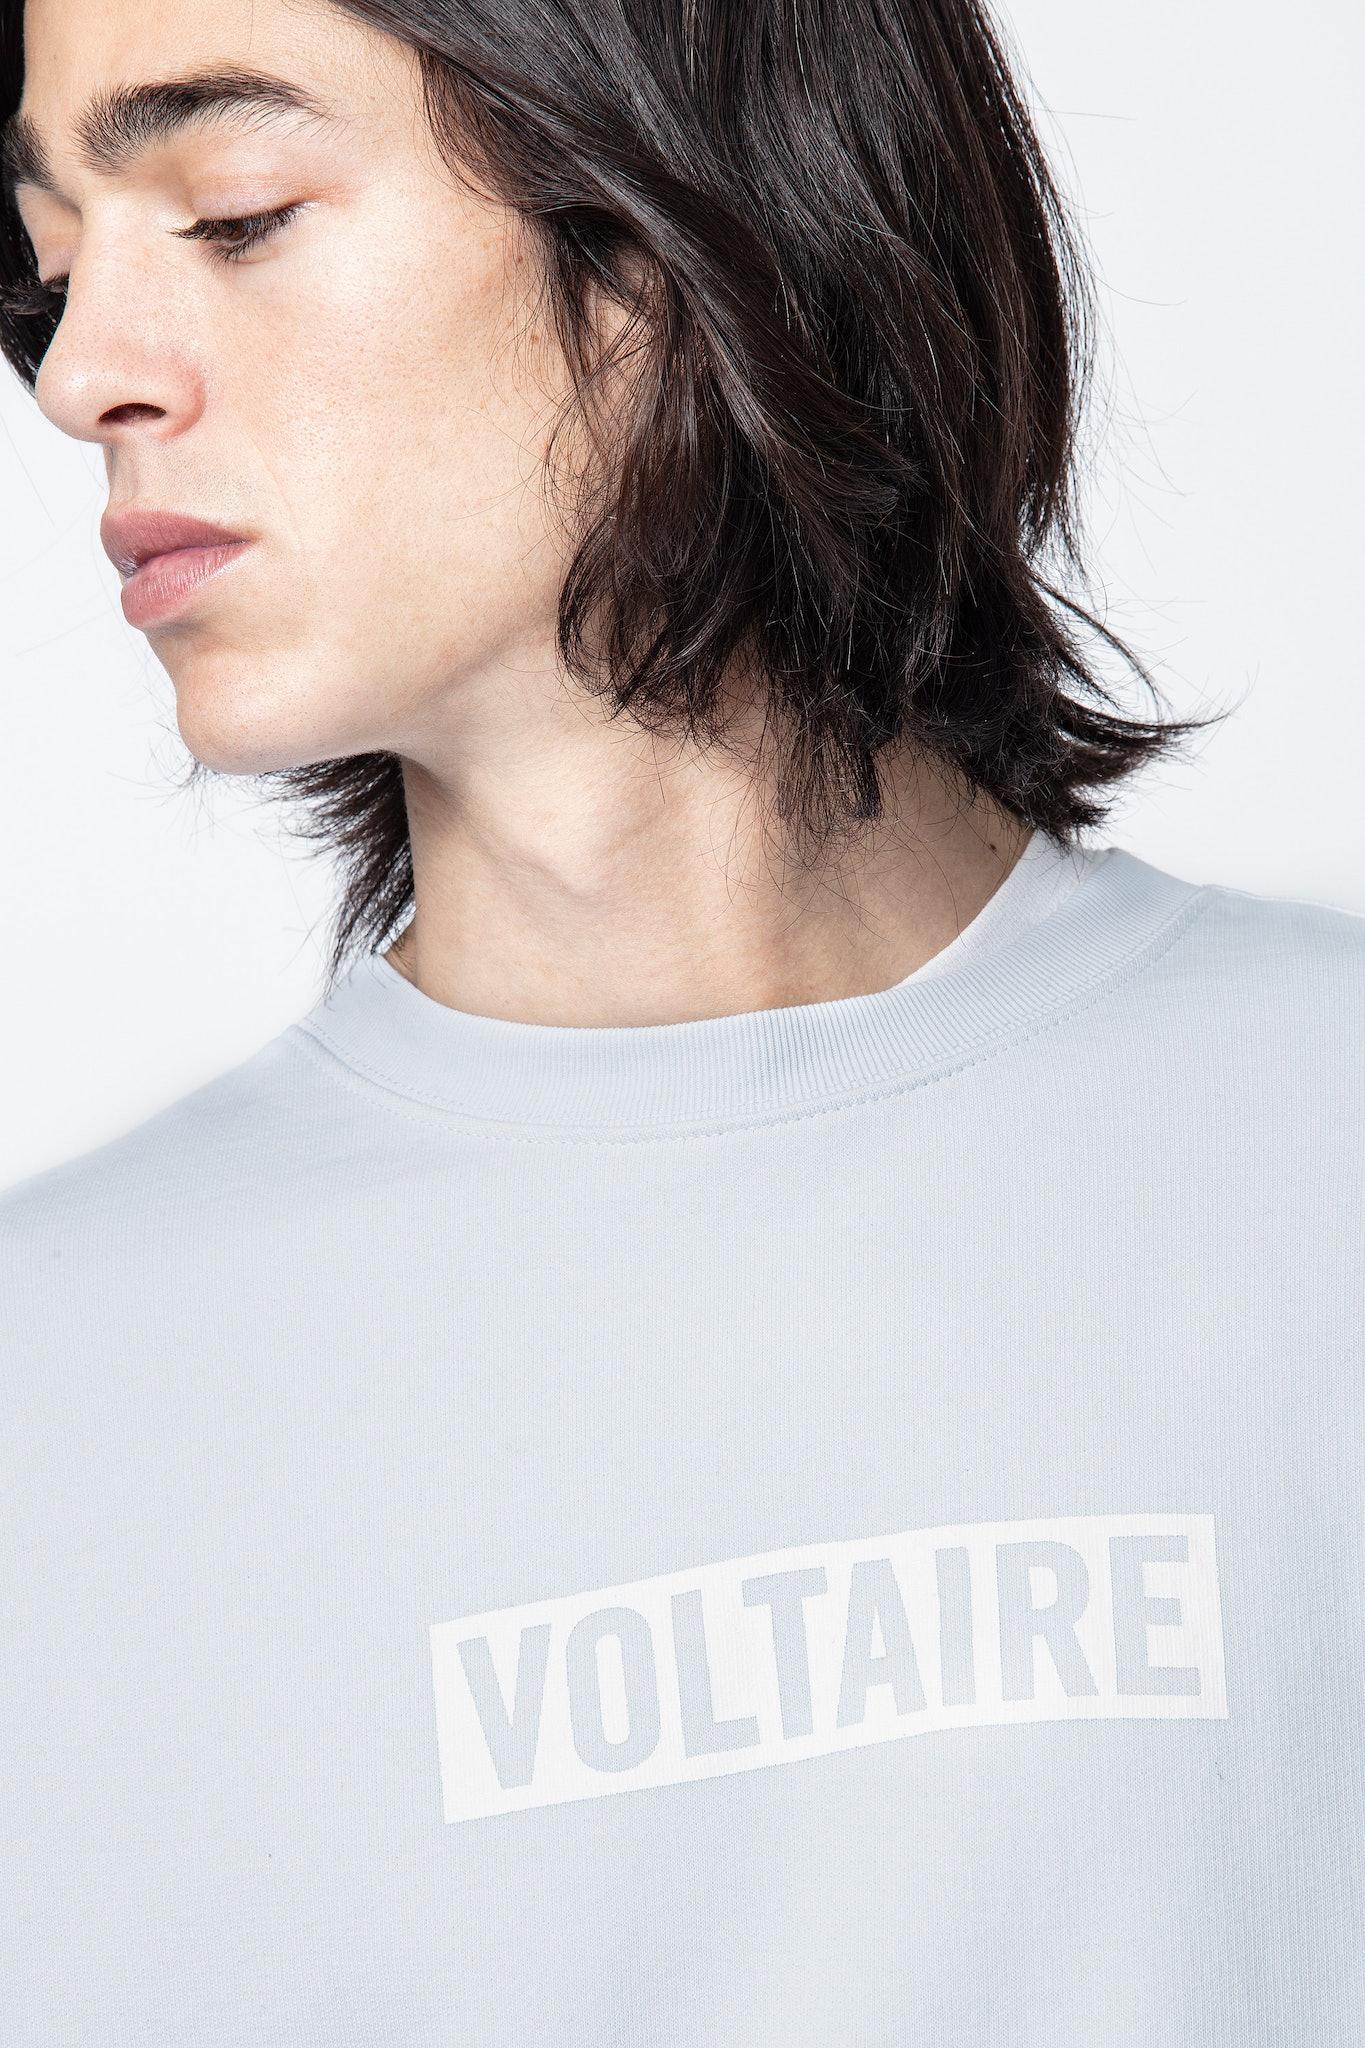 Sudadera Simba Voltaire